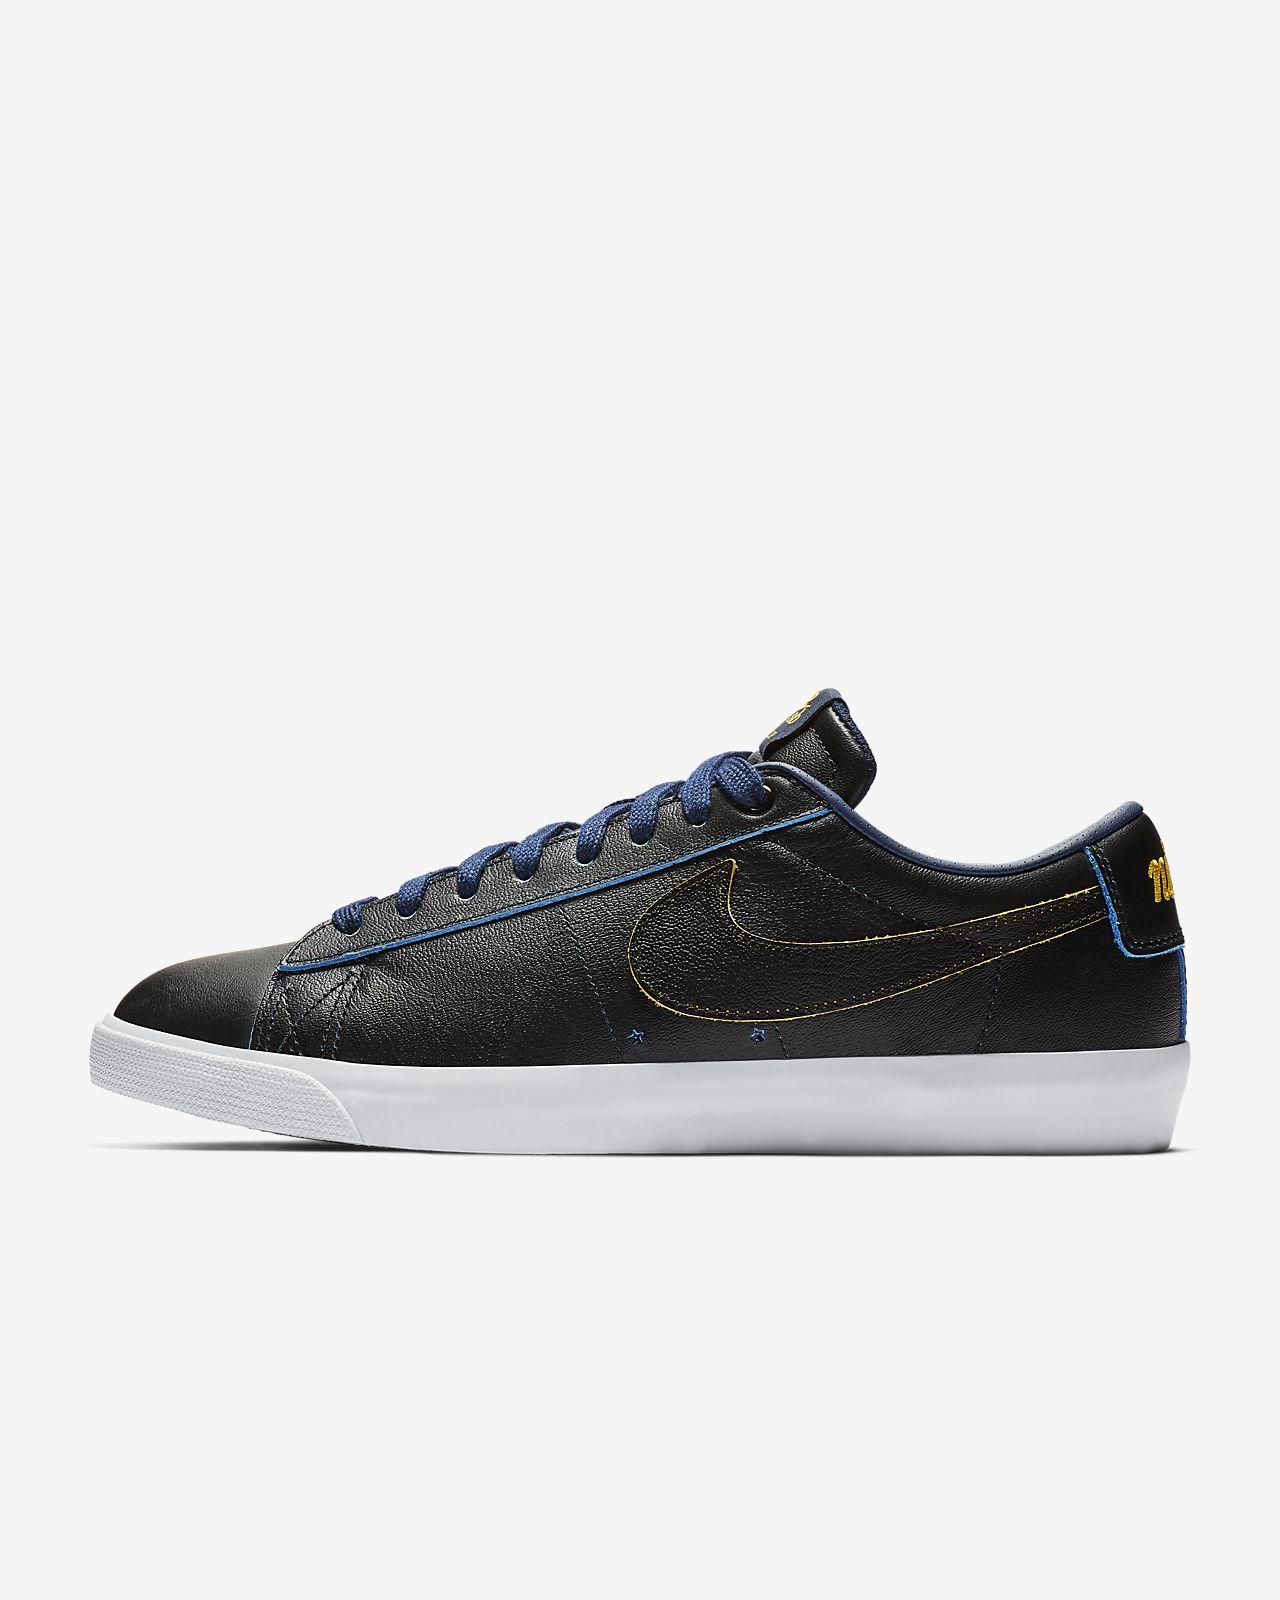 new arrival 518e8 82c21 ... Scarpa da skateboard Nike SB Blazer Low GT NBA - Uomo